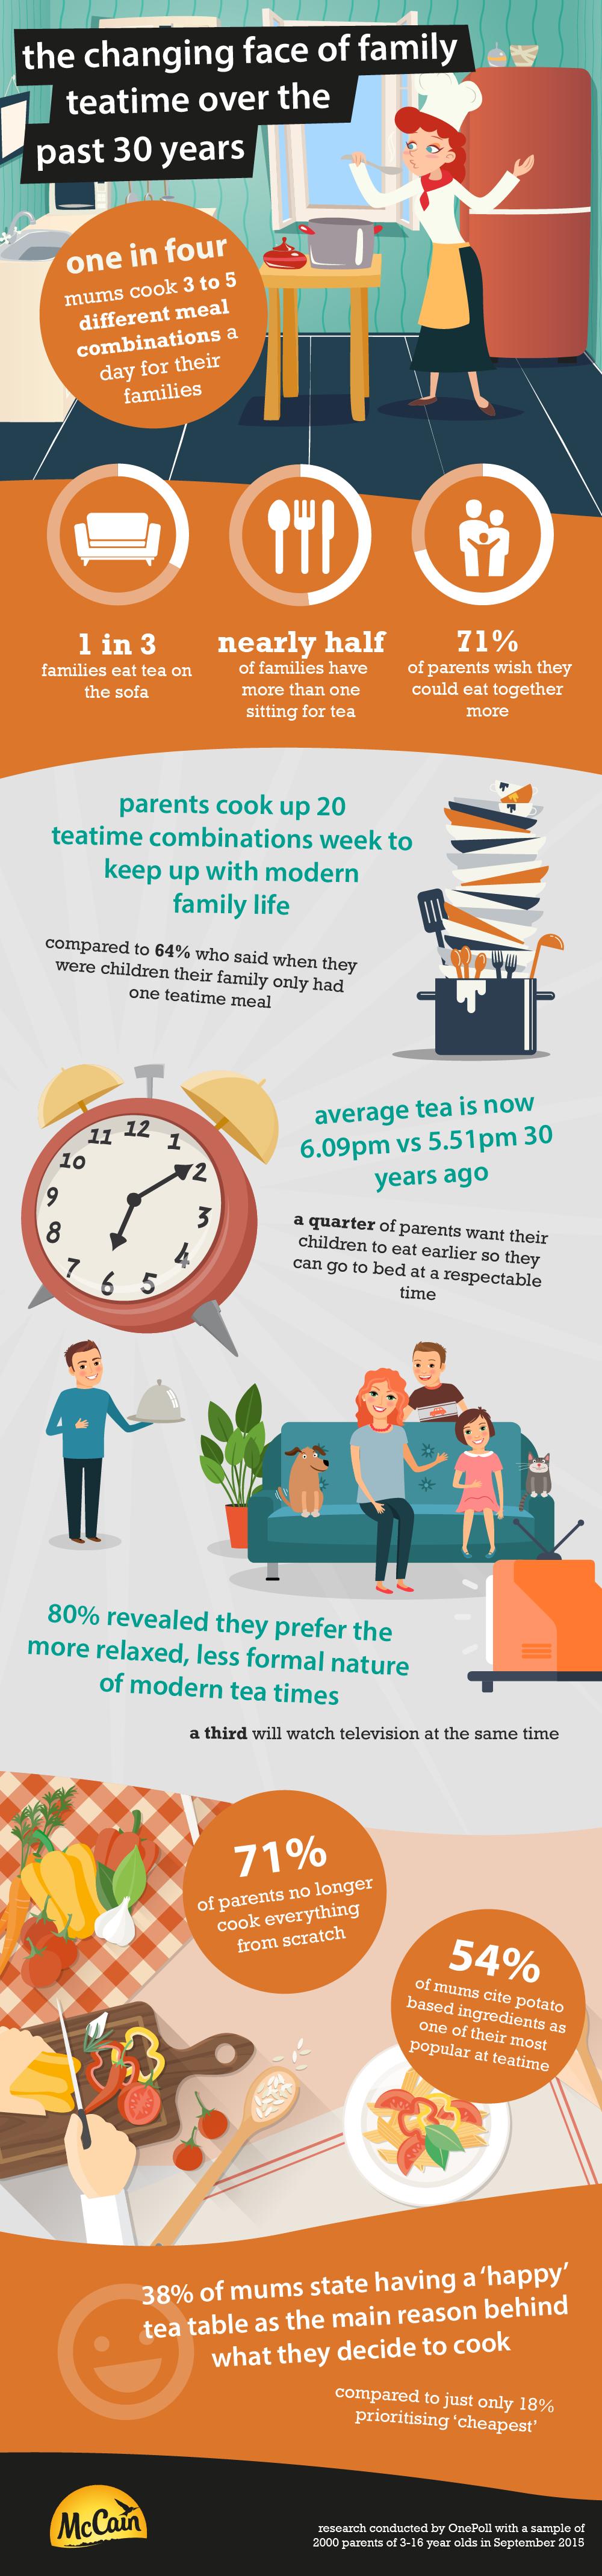 McCain's Teatime infographic